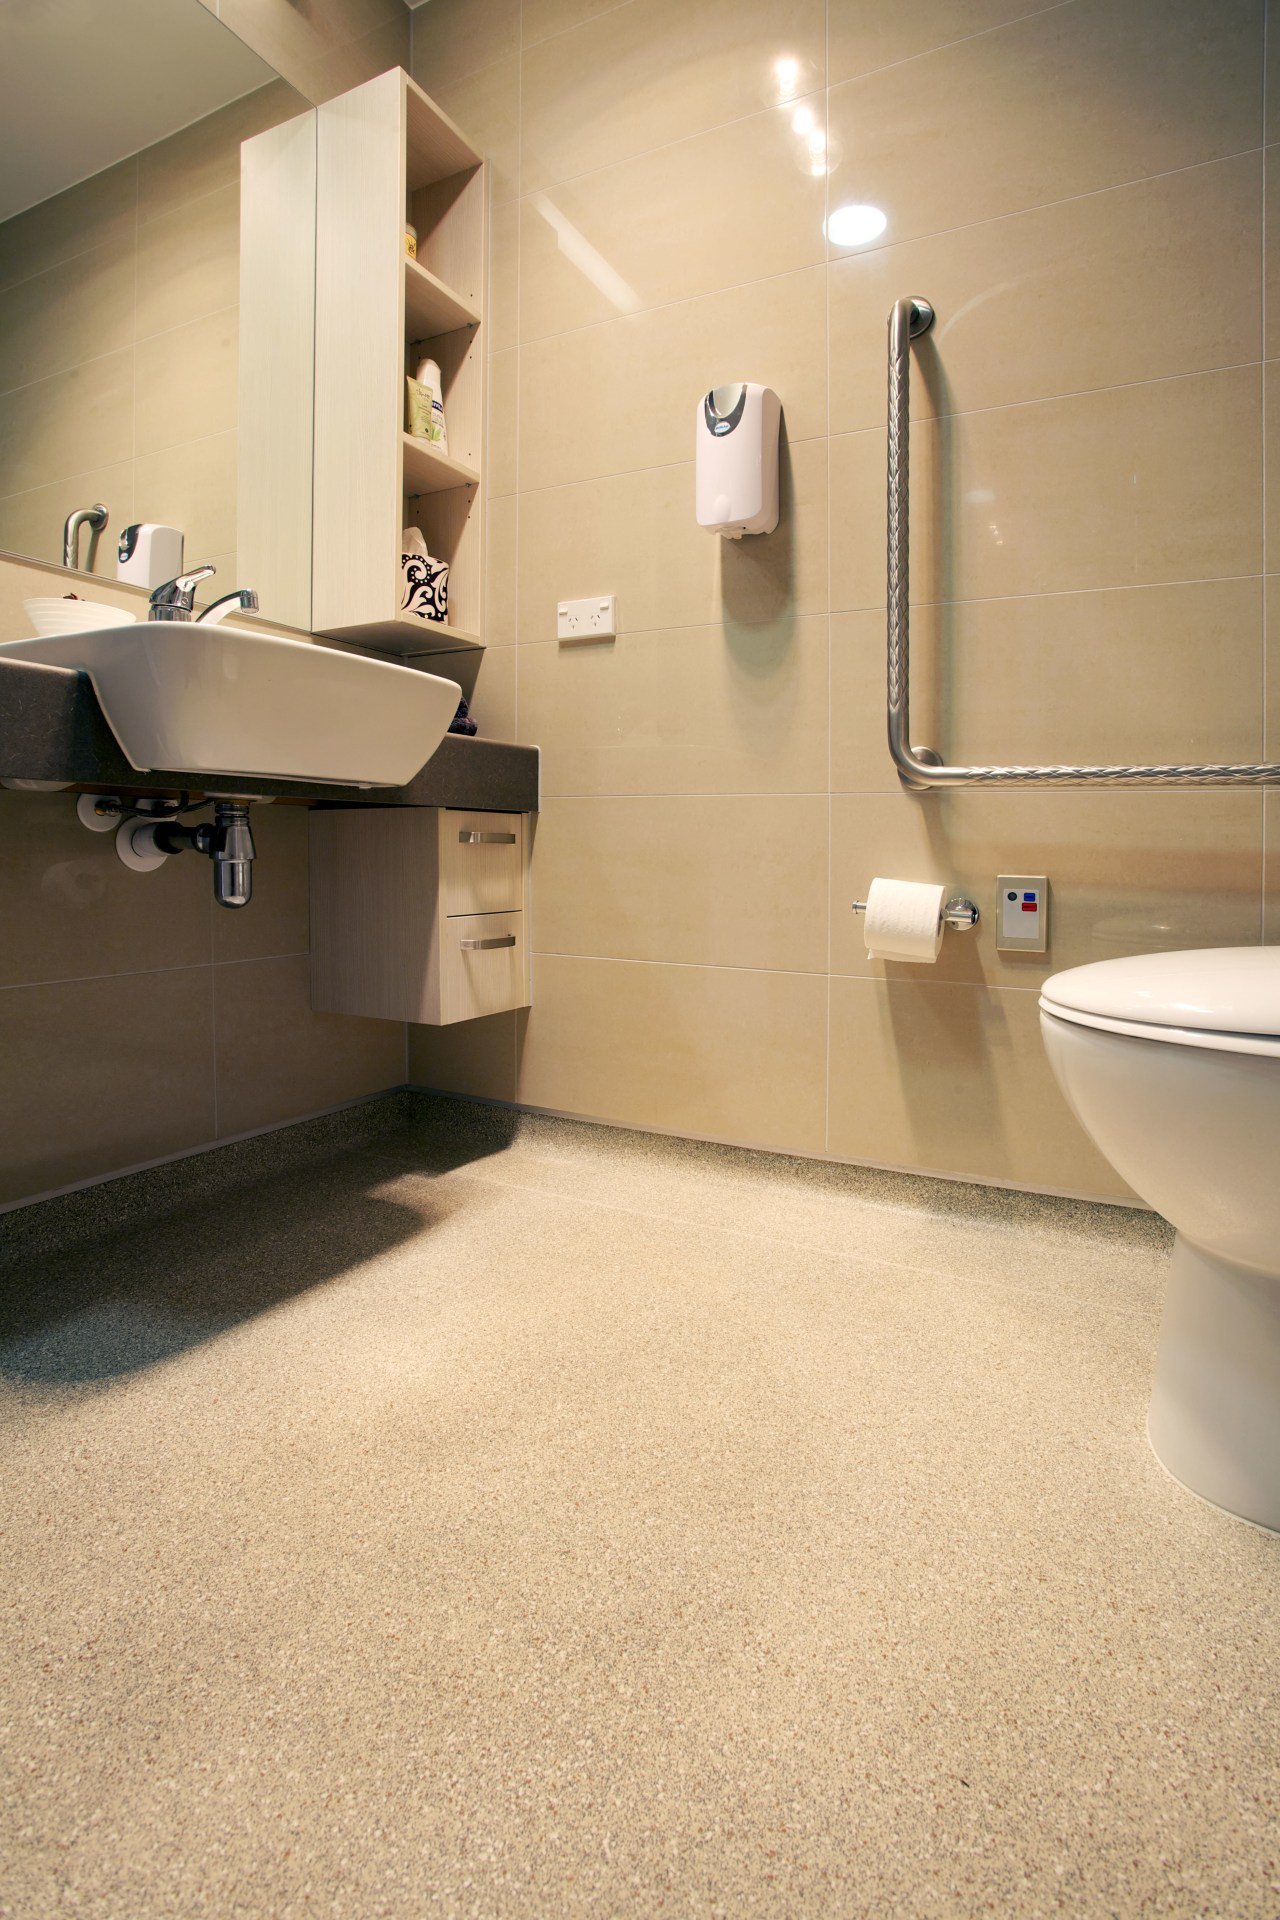 Durable, safe, anti-slip flooring for bathrooms in the bathroom, floor, flooring, interior design, plumbing fixture, product design, room, sink, tap, tile, orange